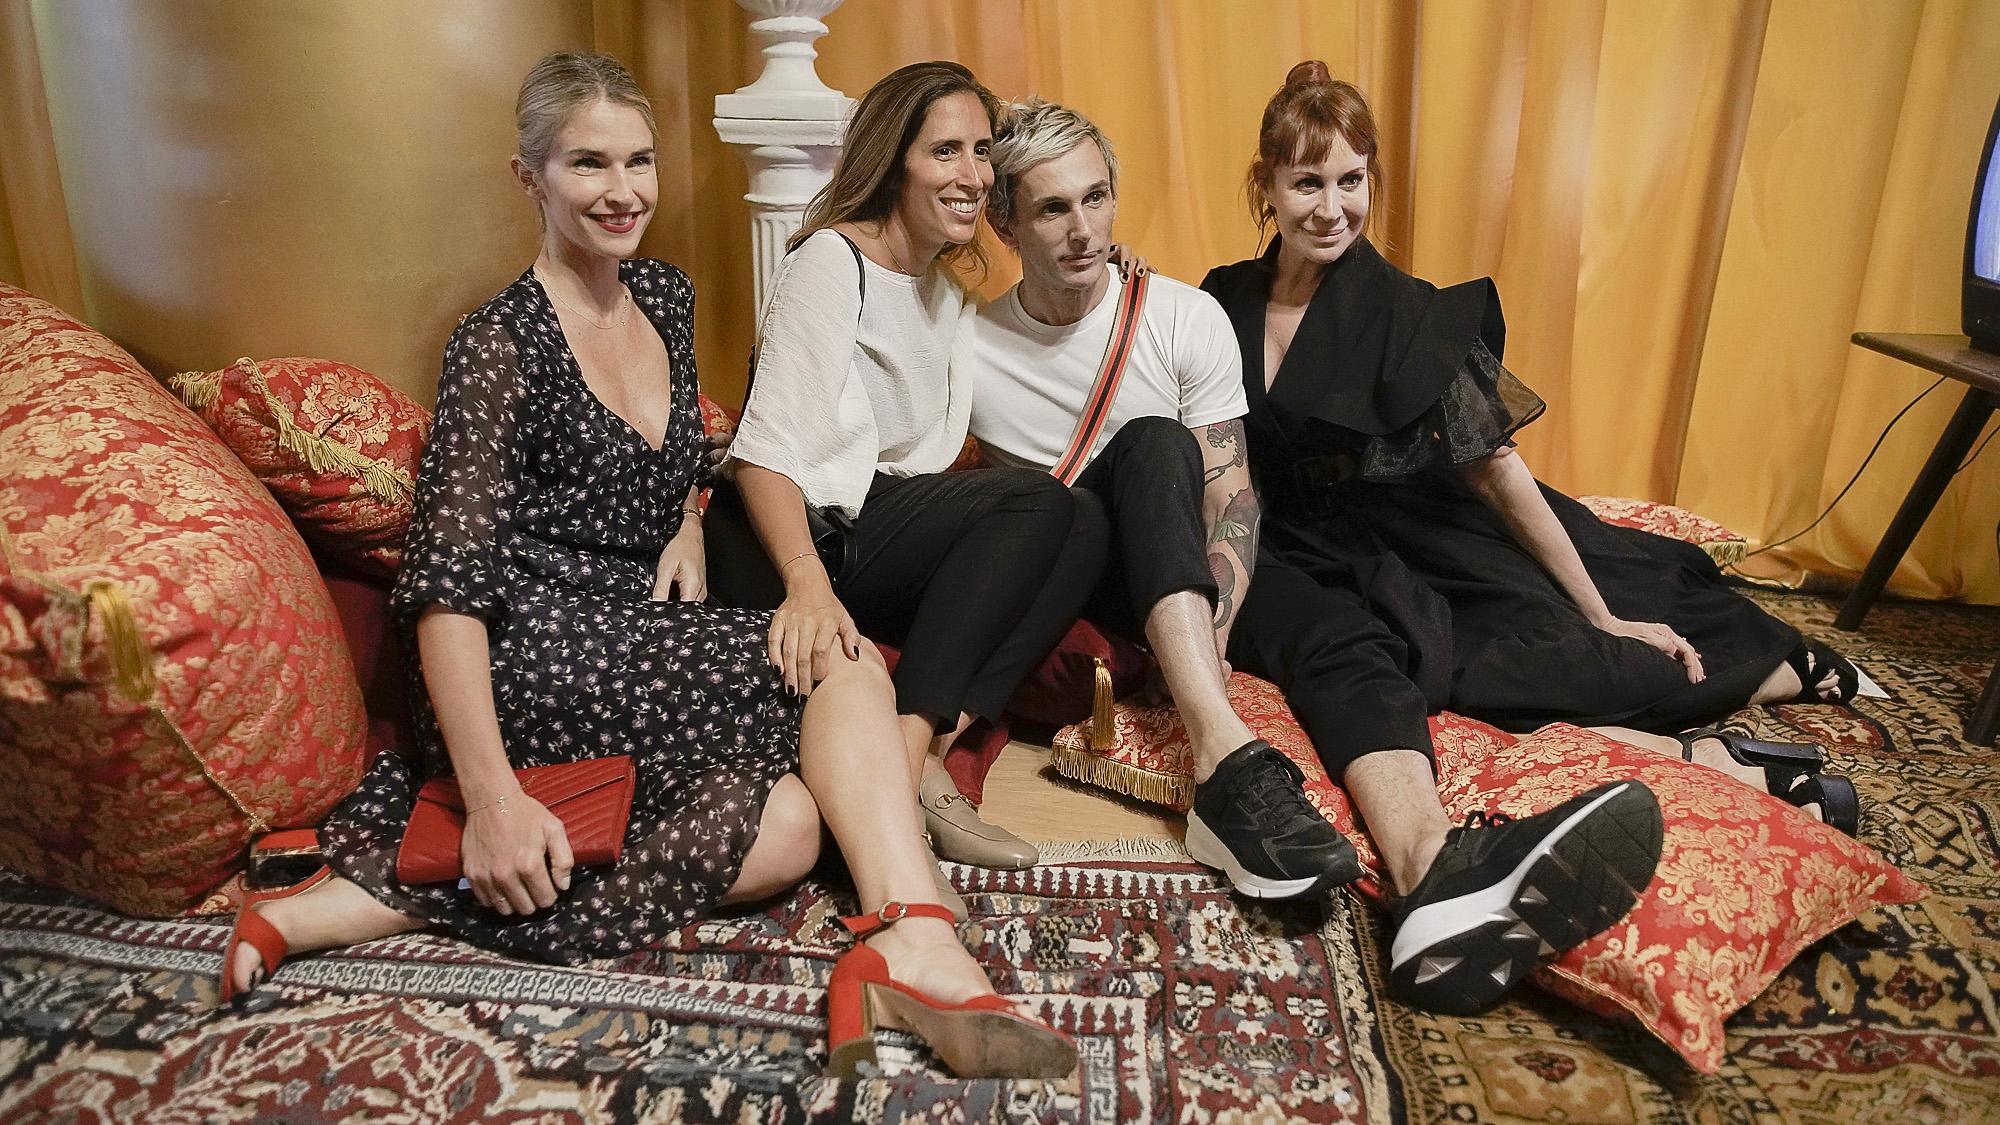 Julieta Spina, Florencia Perotti, Fabián Paz y Matilda Blanco